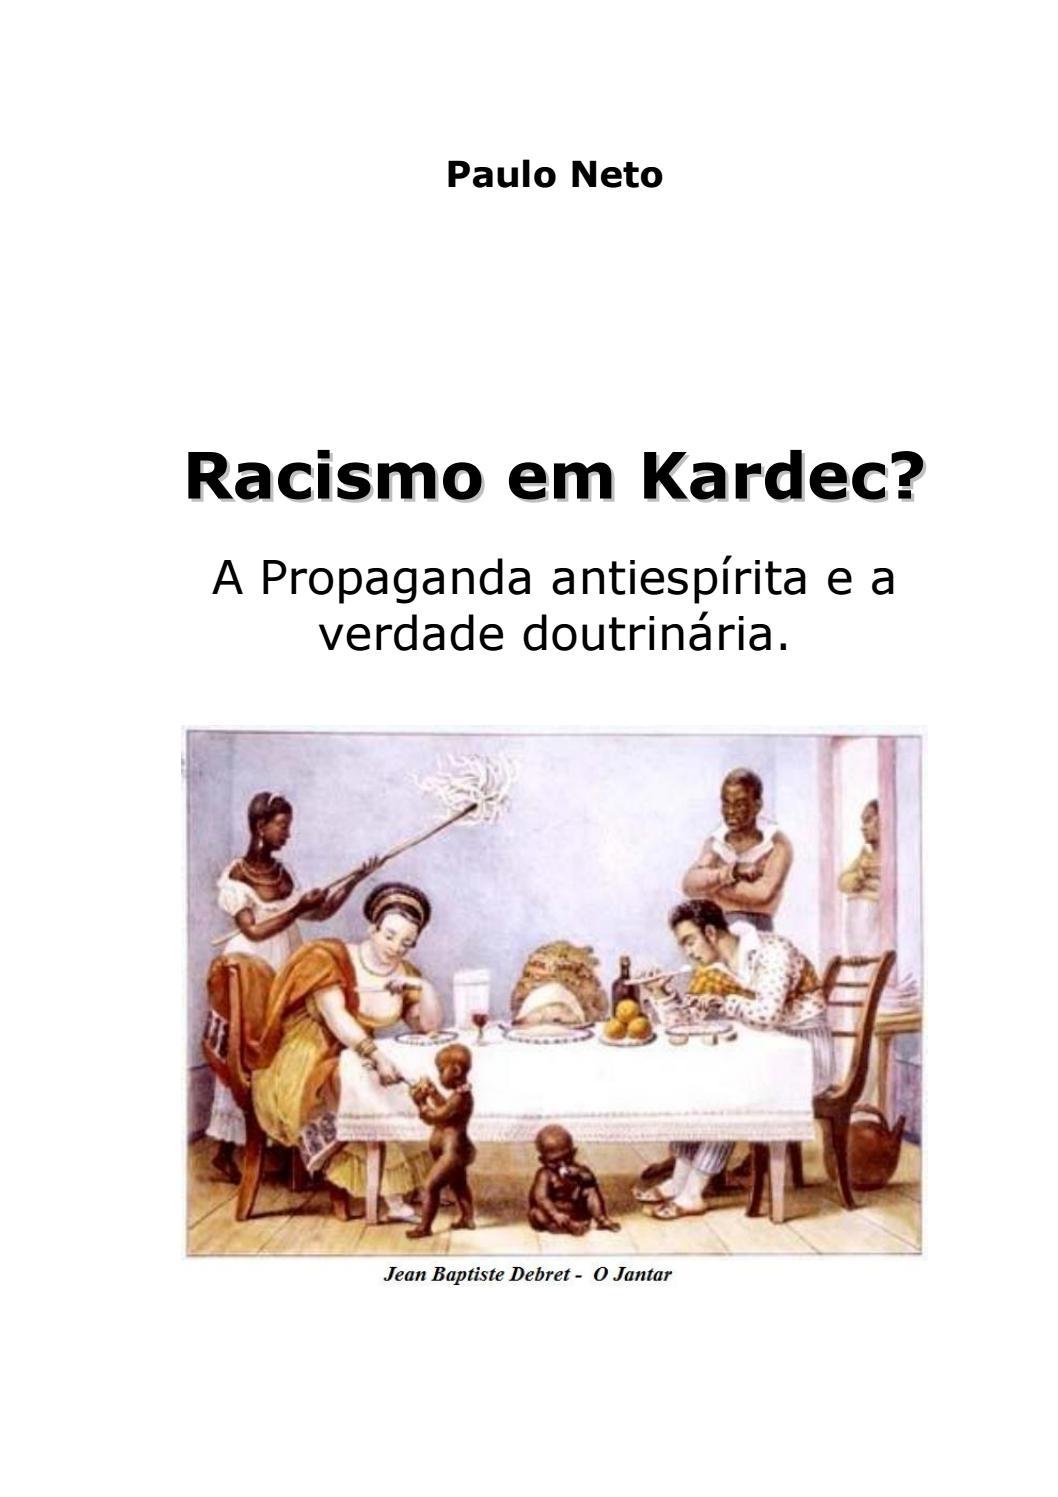 094490ab7a1 Racismo em Kardec   Paulo Neto  by Júlio César Pedrosa - issuu